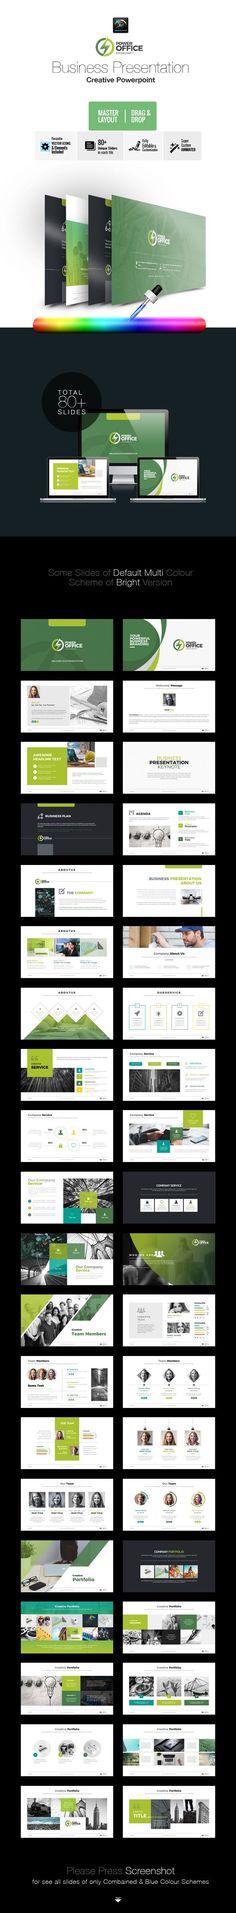 Material Keynote Presentation Template Pinterest Presentation - Unique product launch presentation ppt scheme